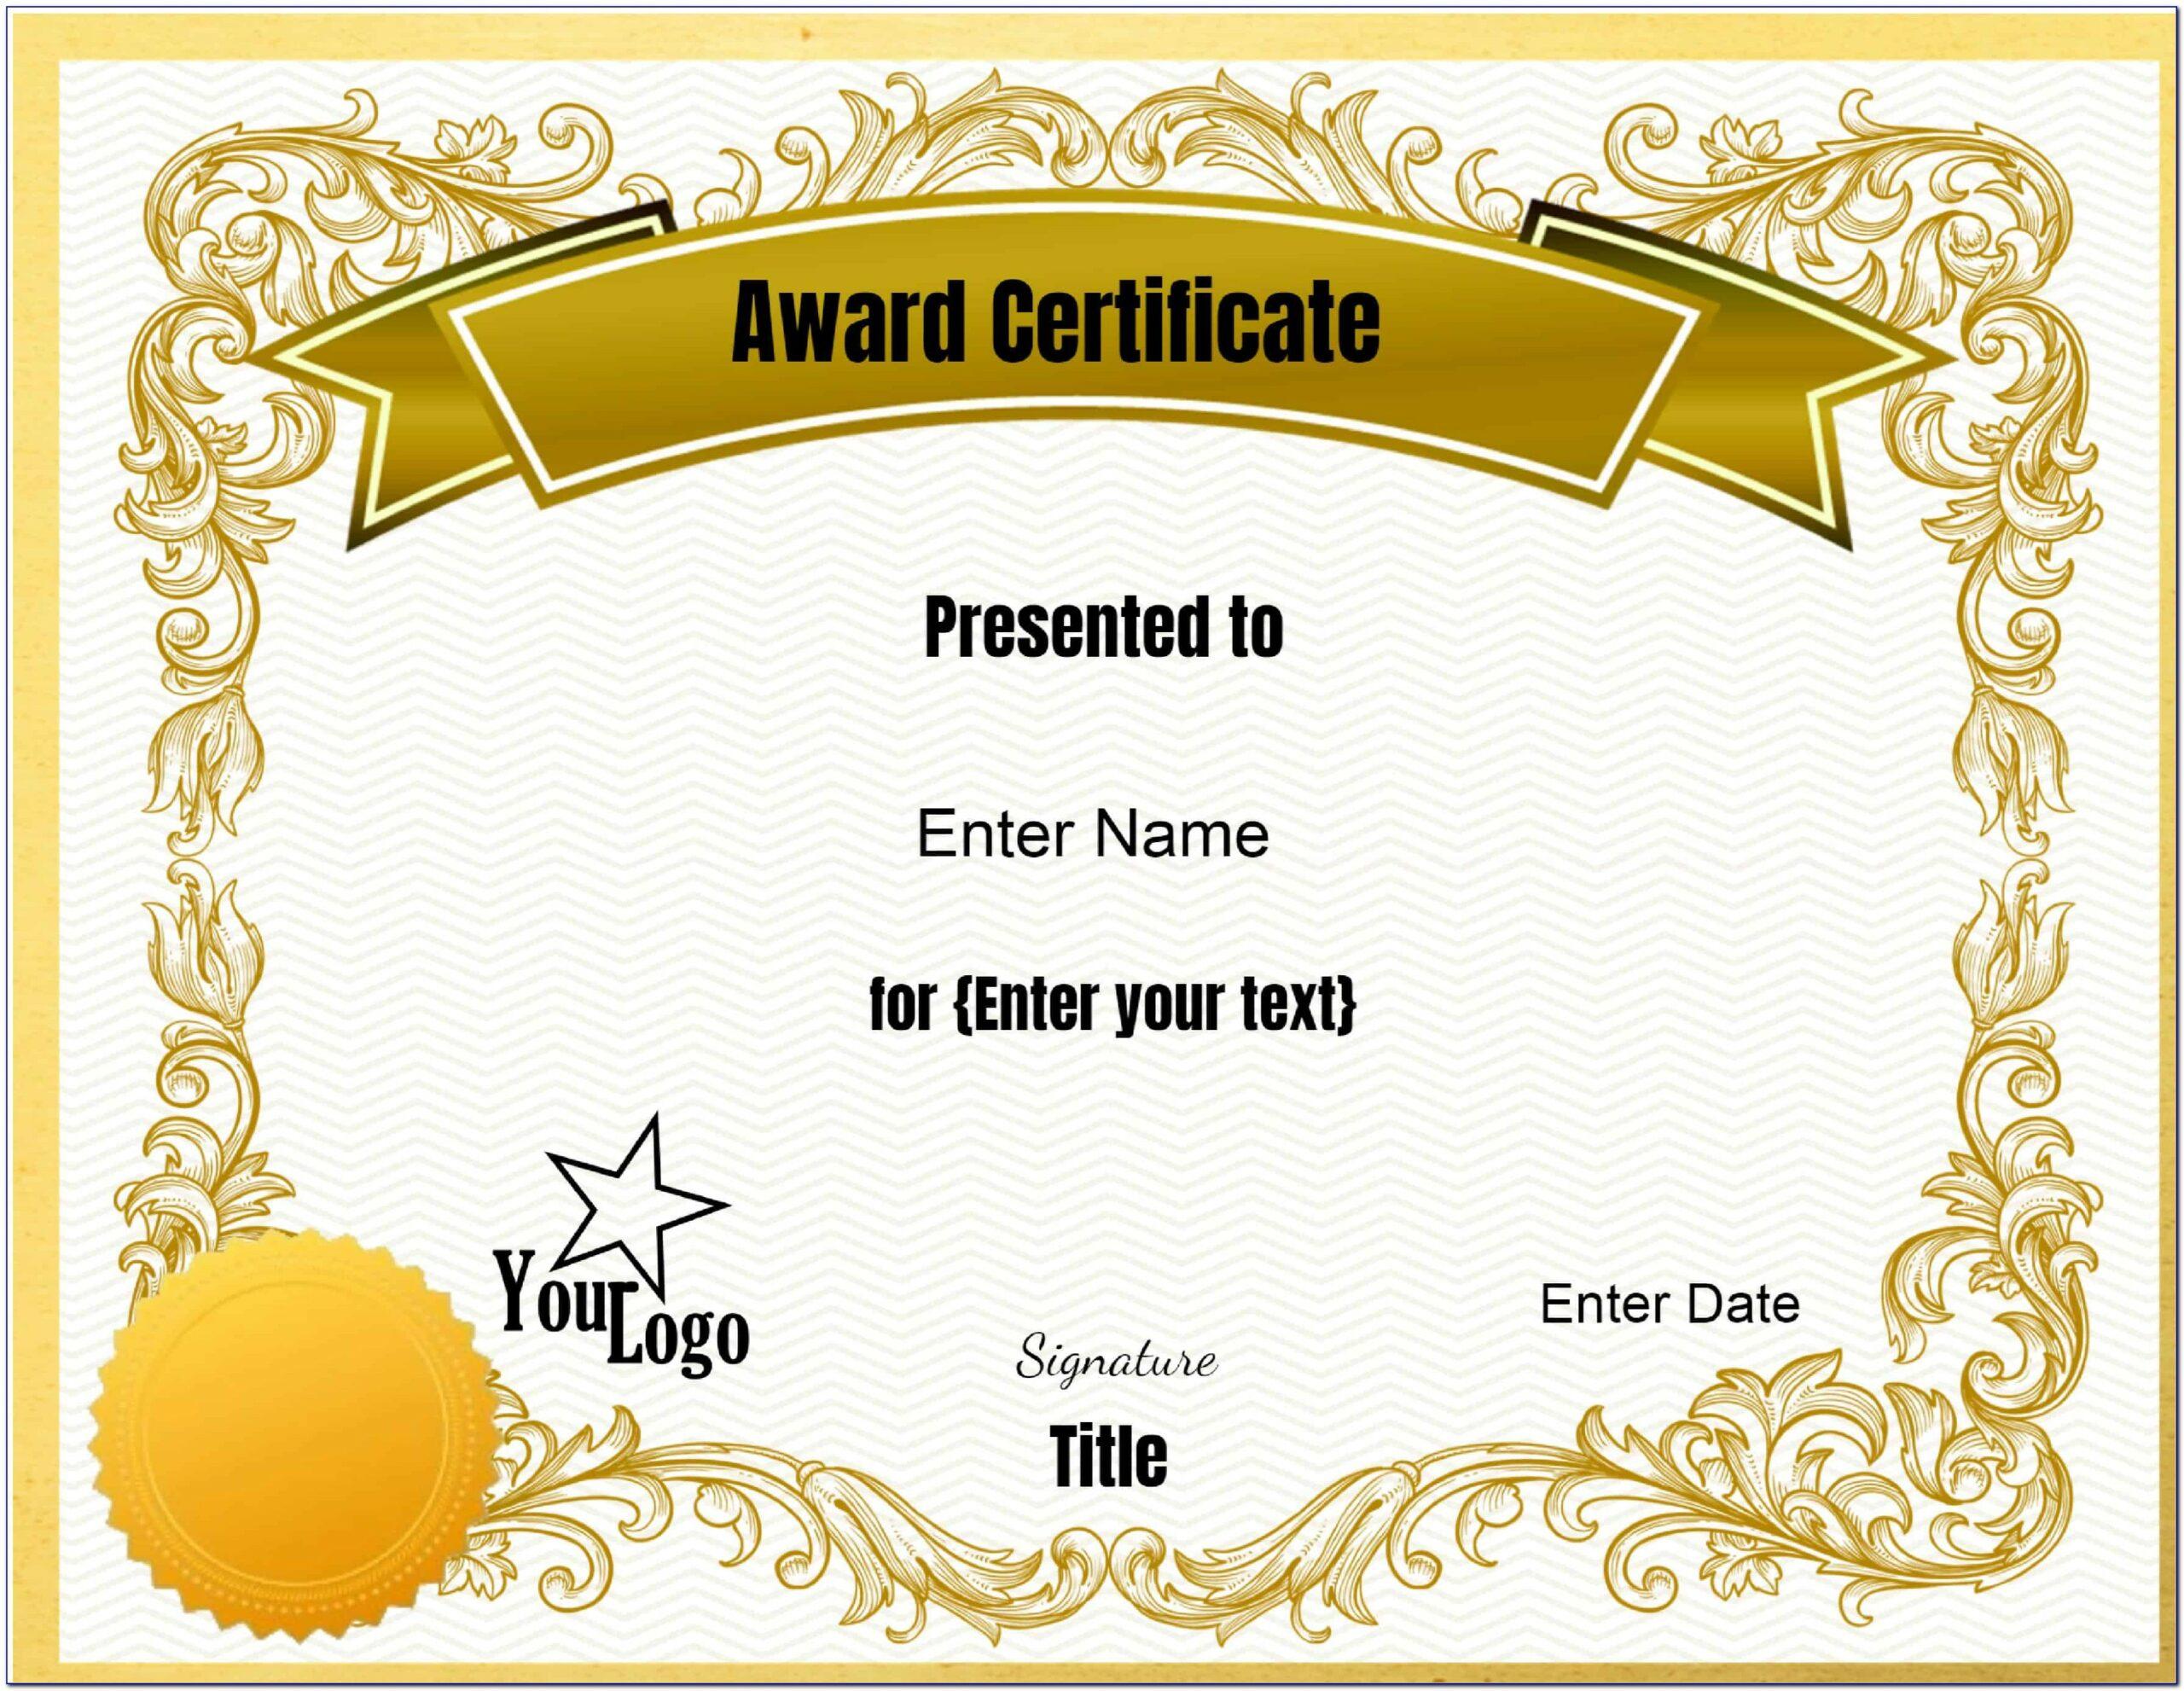 Free Certificate Of Award Templates